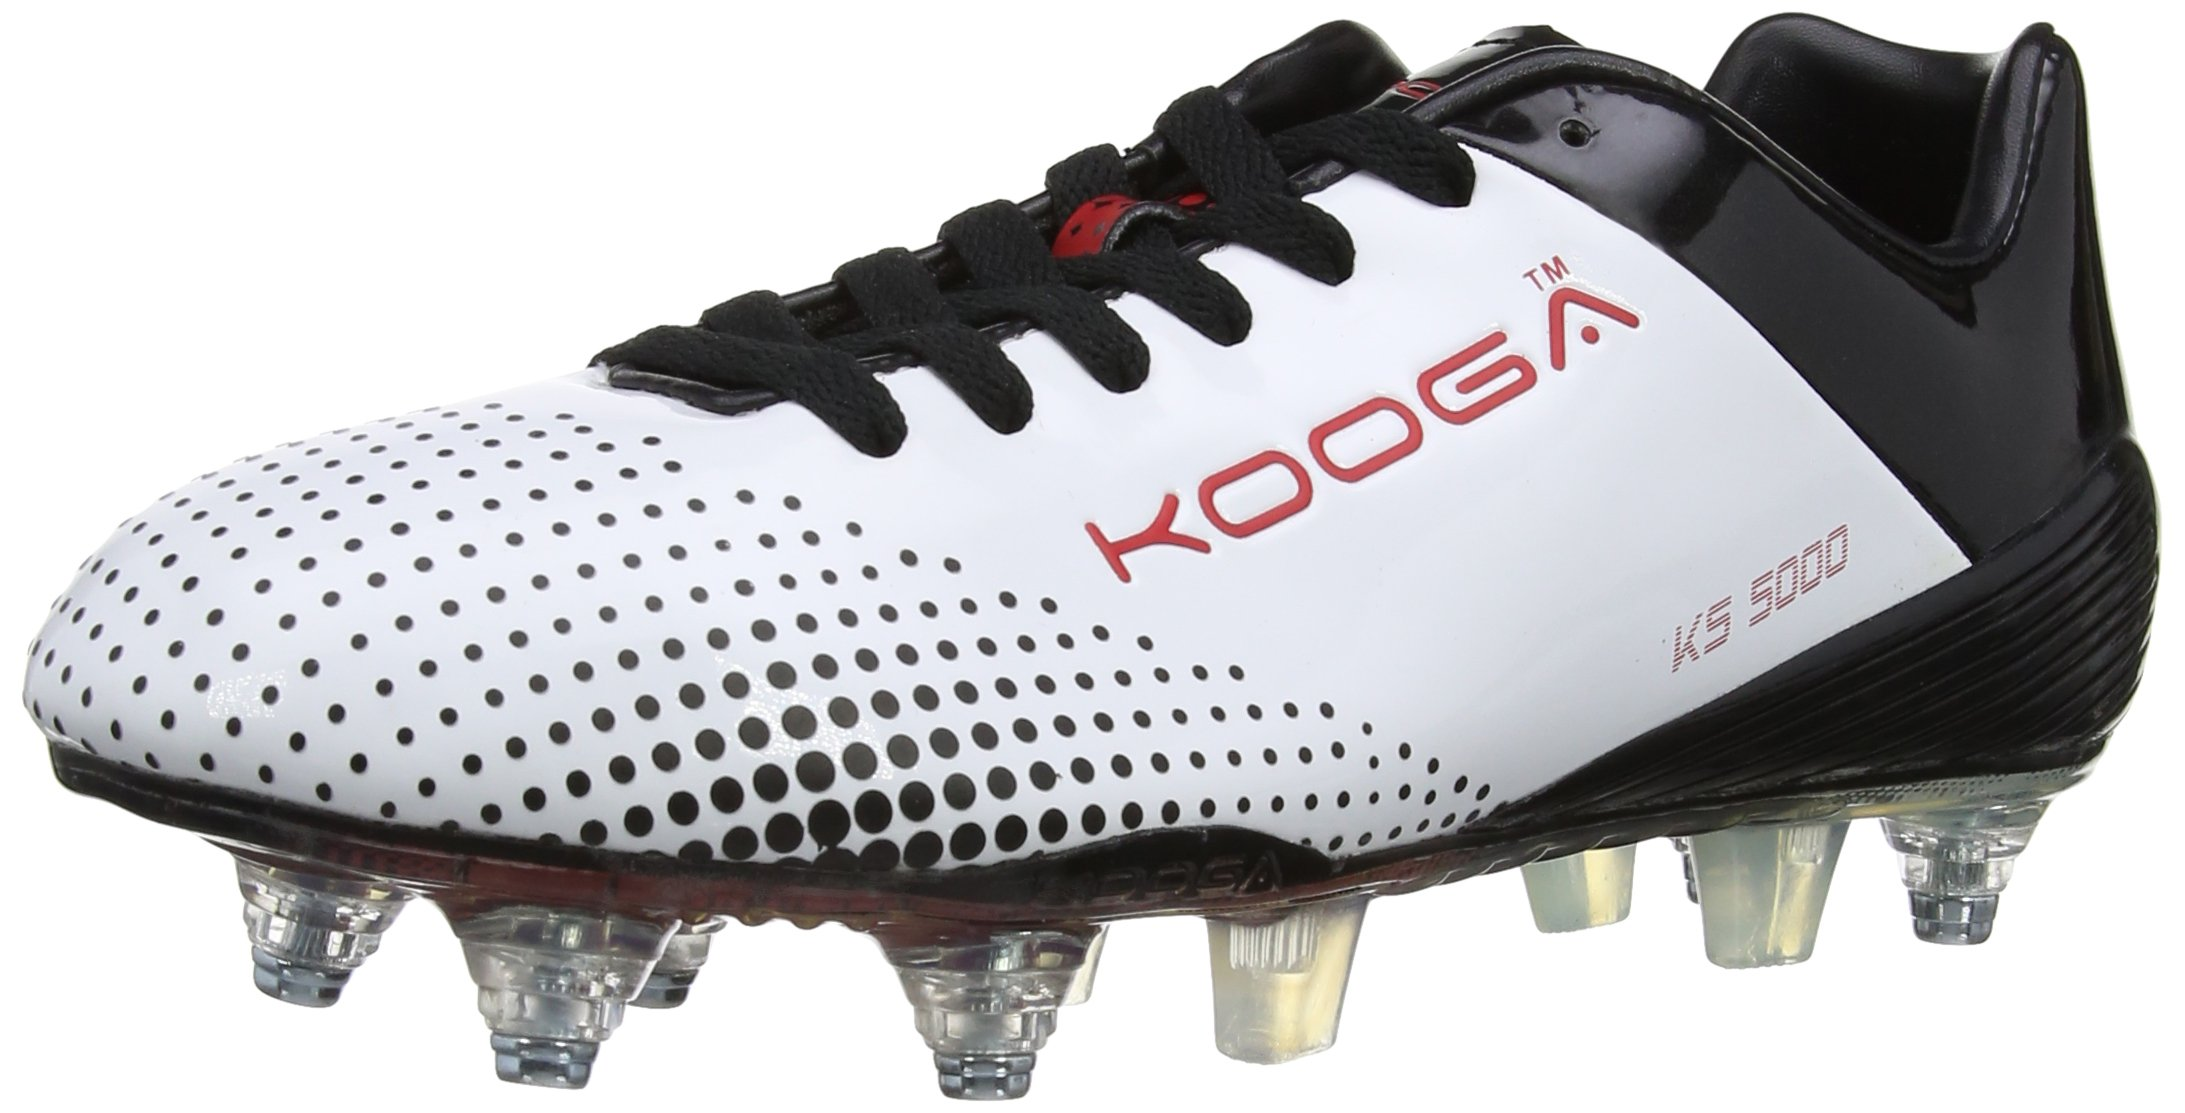 Kooga Ks 5000 Lcst Combo Boot 14/15